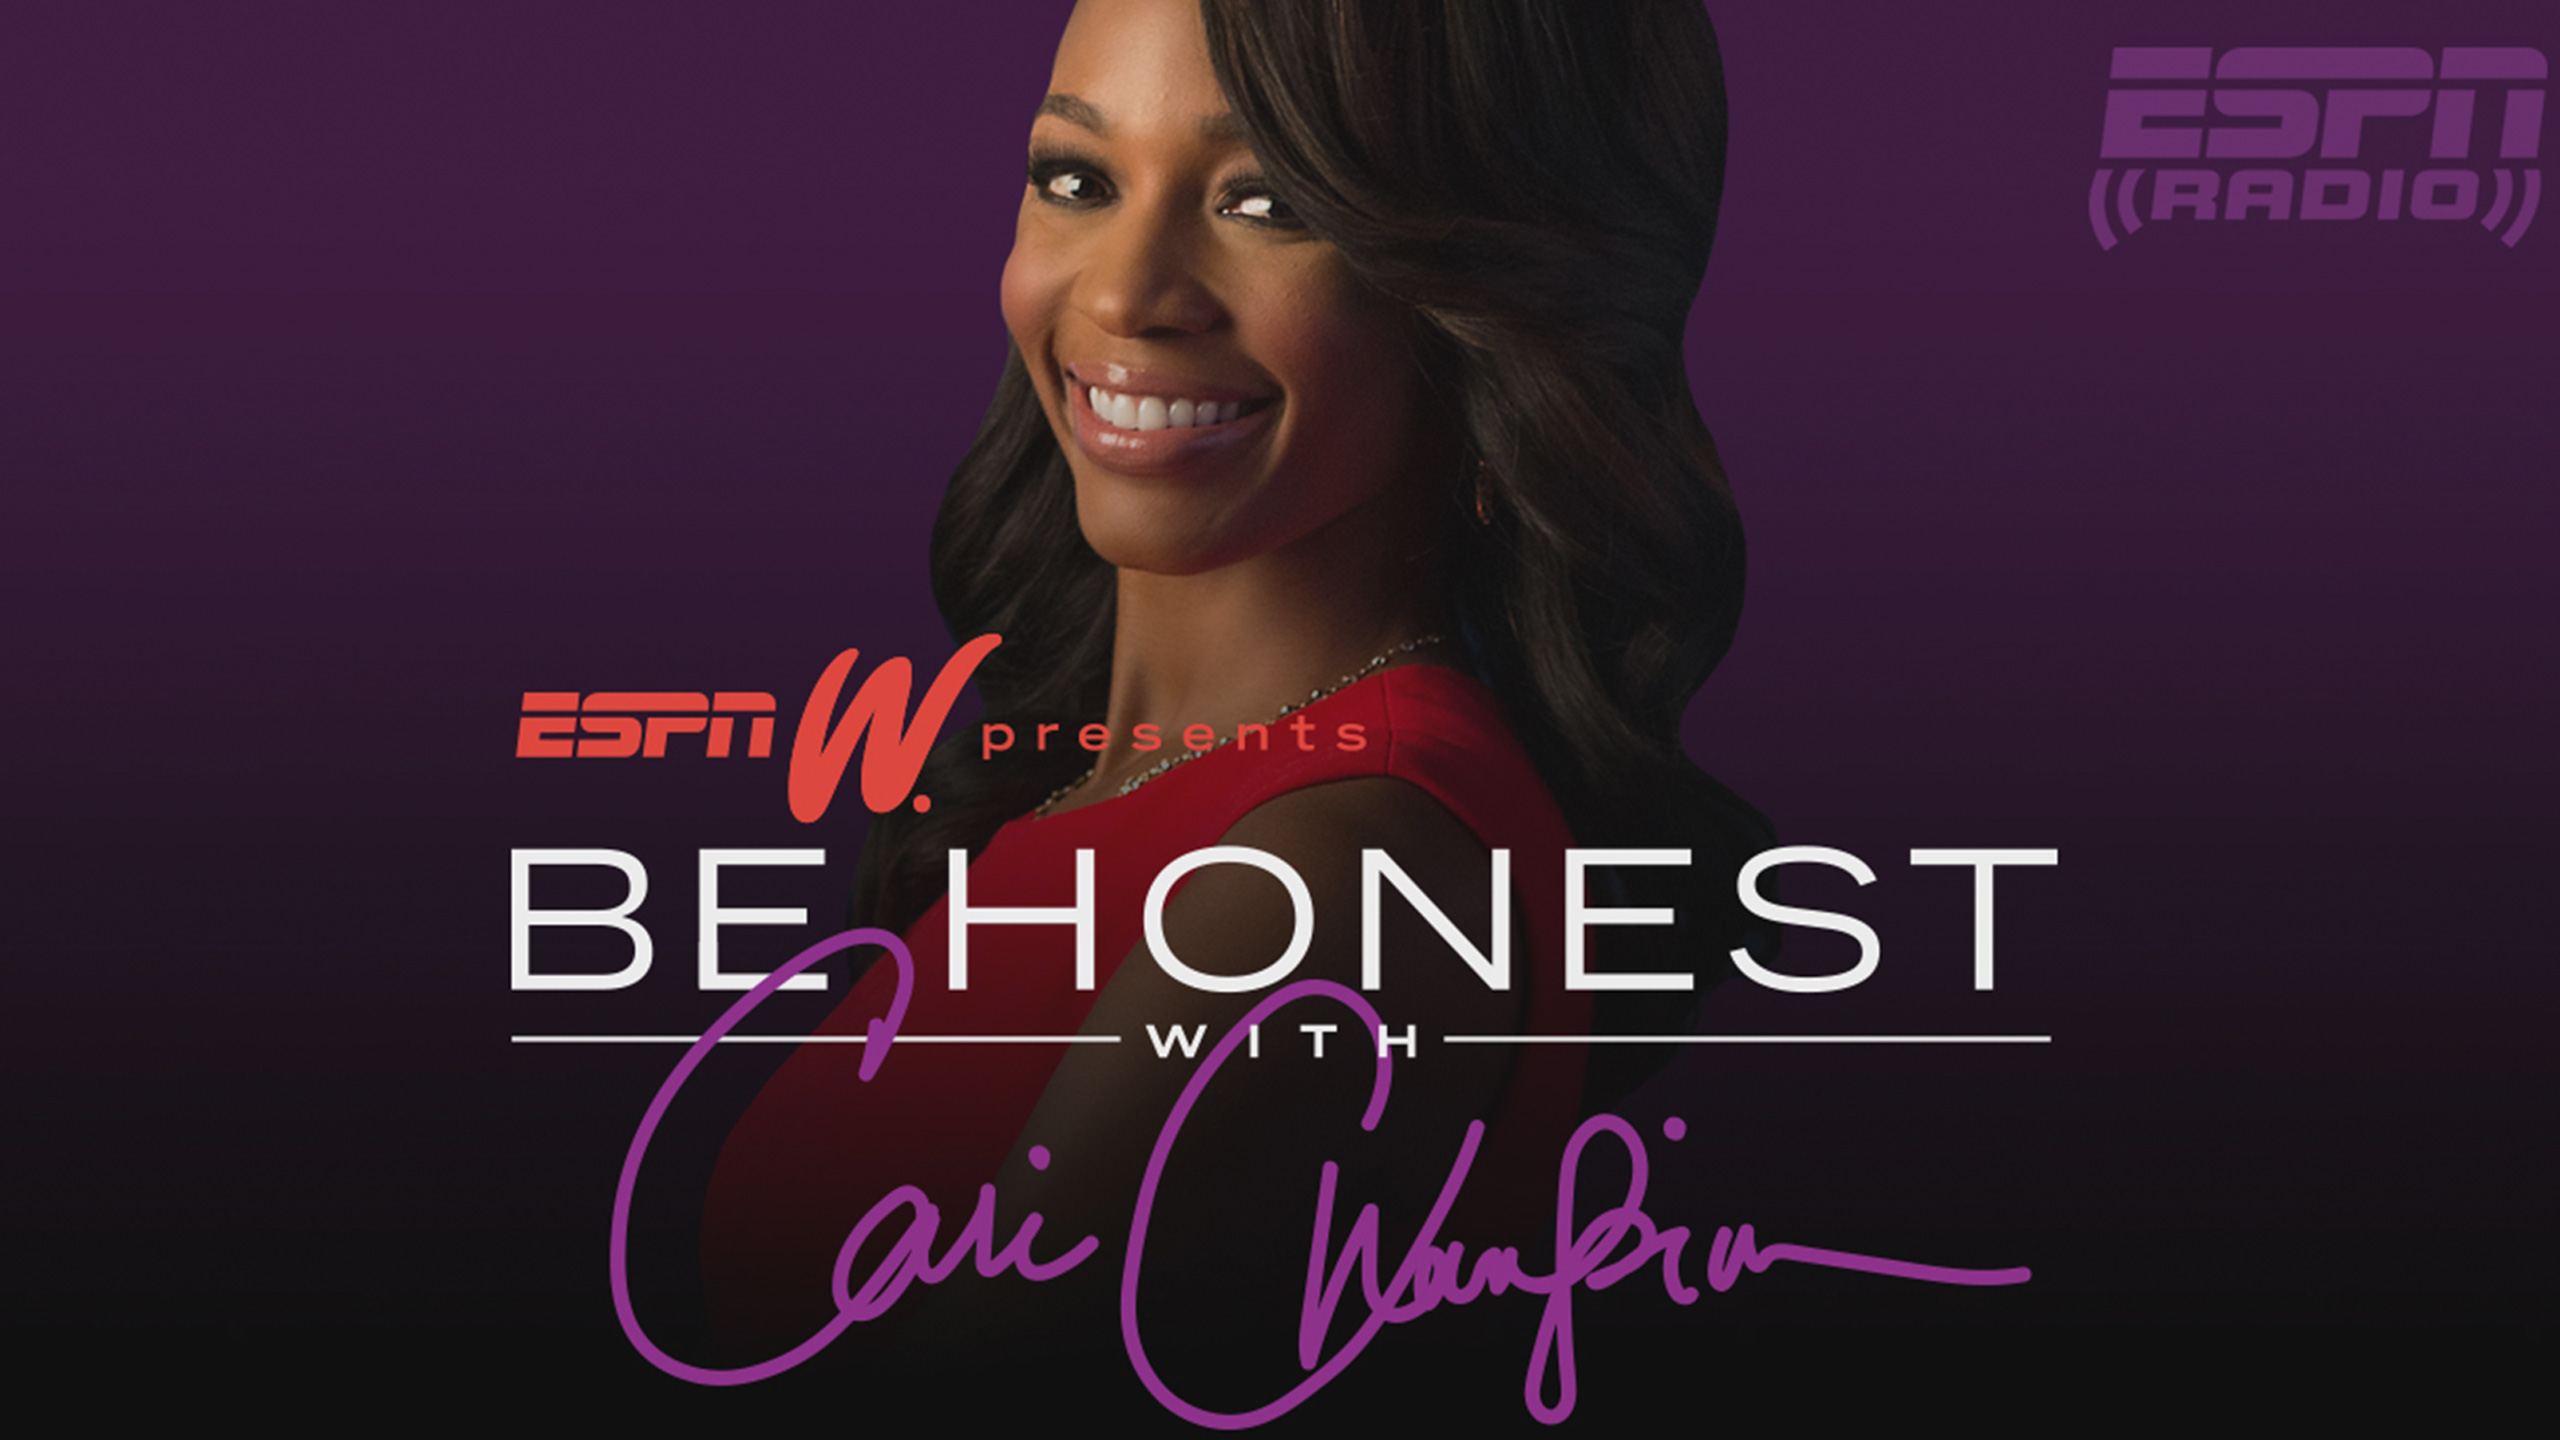 Tue, 12/18 - Be Honest with Cari Champion